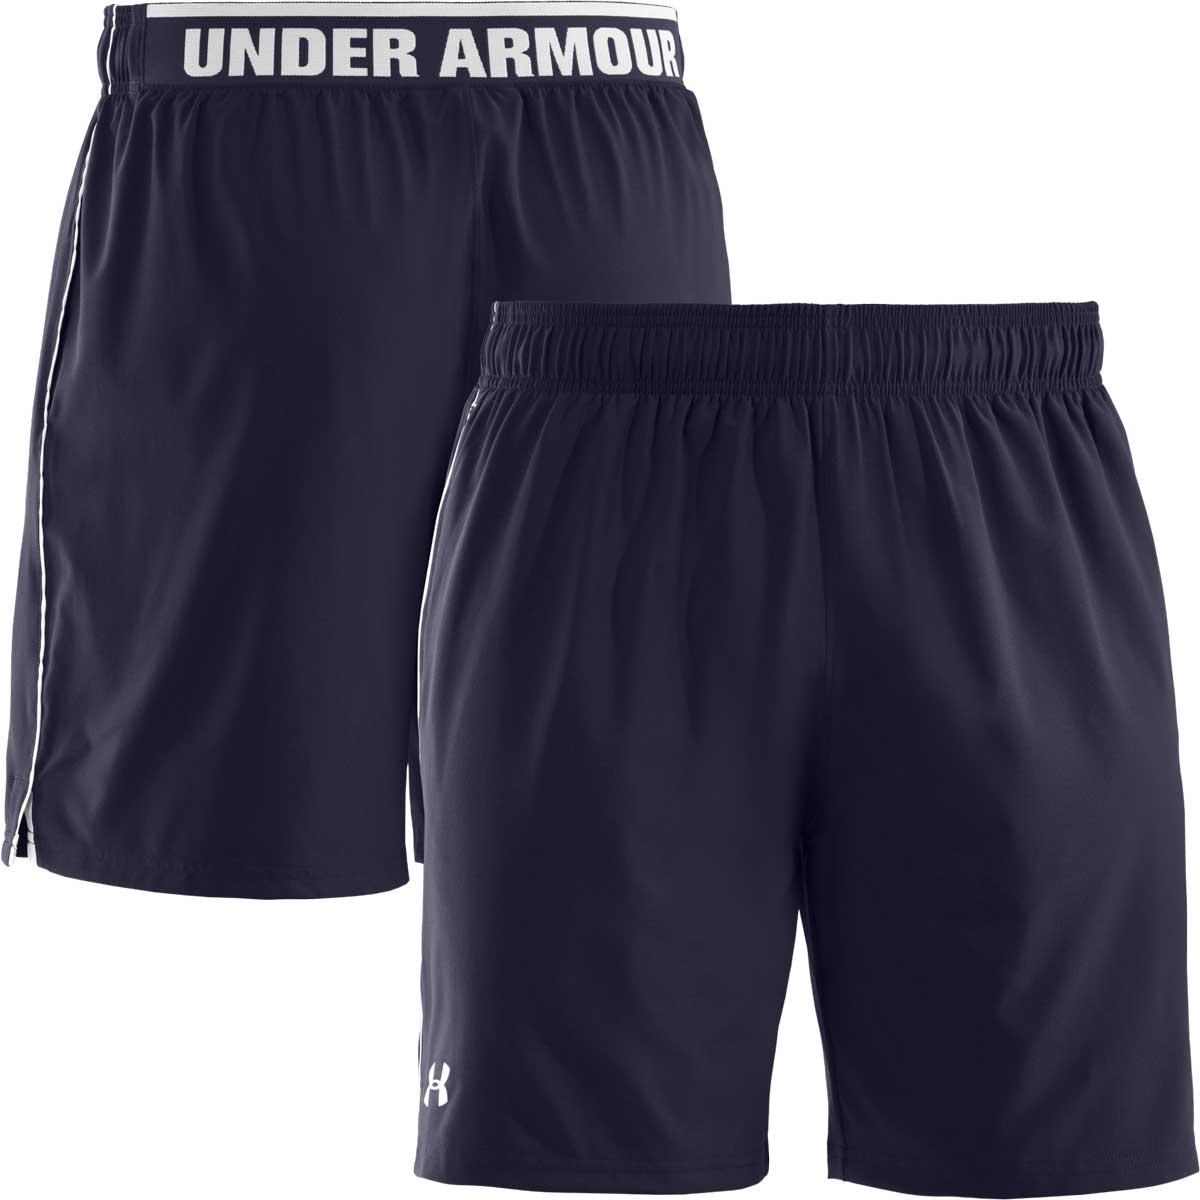 Under Armour Short Heatgear Blu Uomo 1